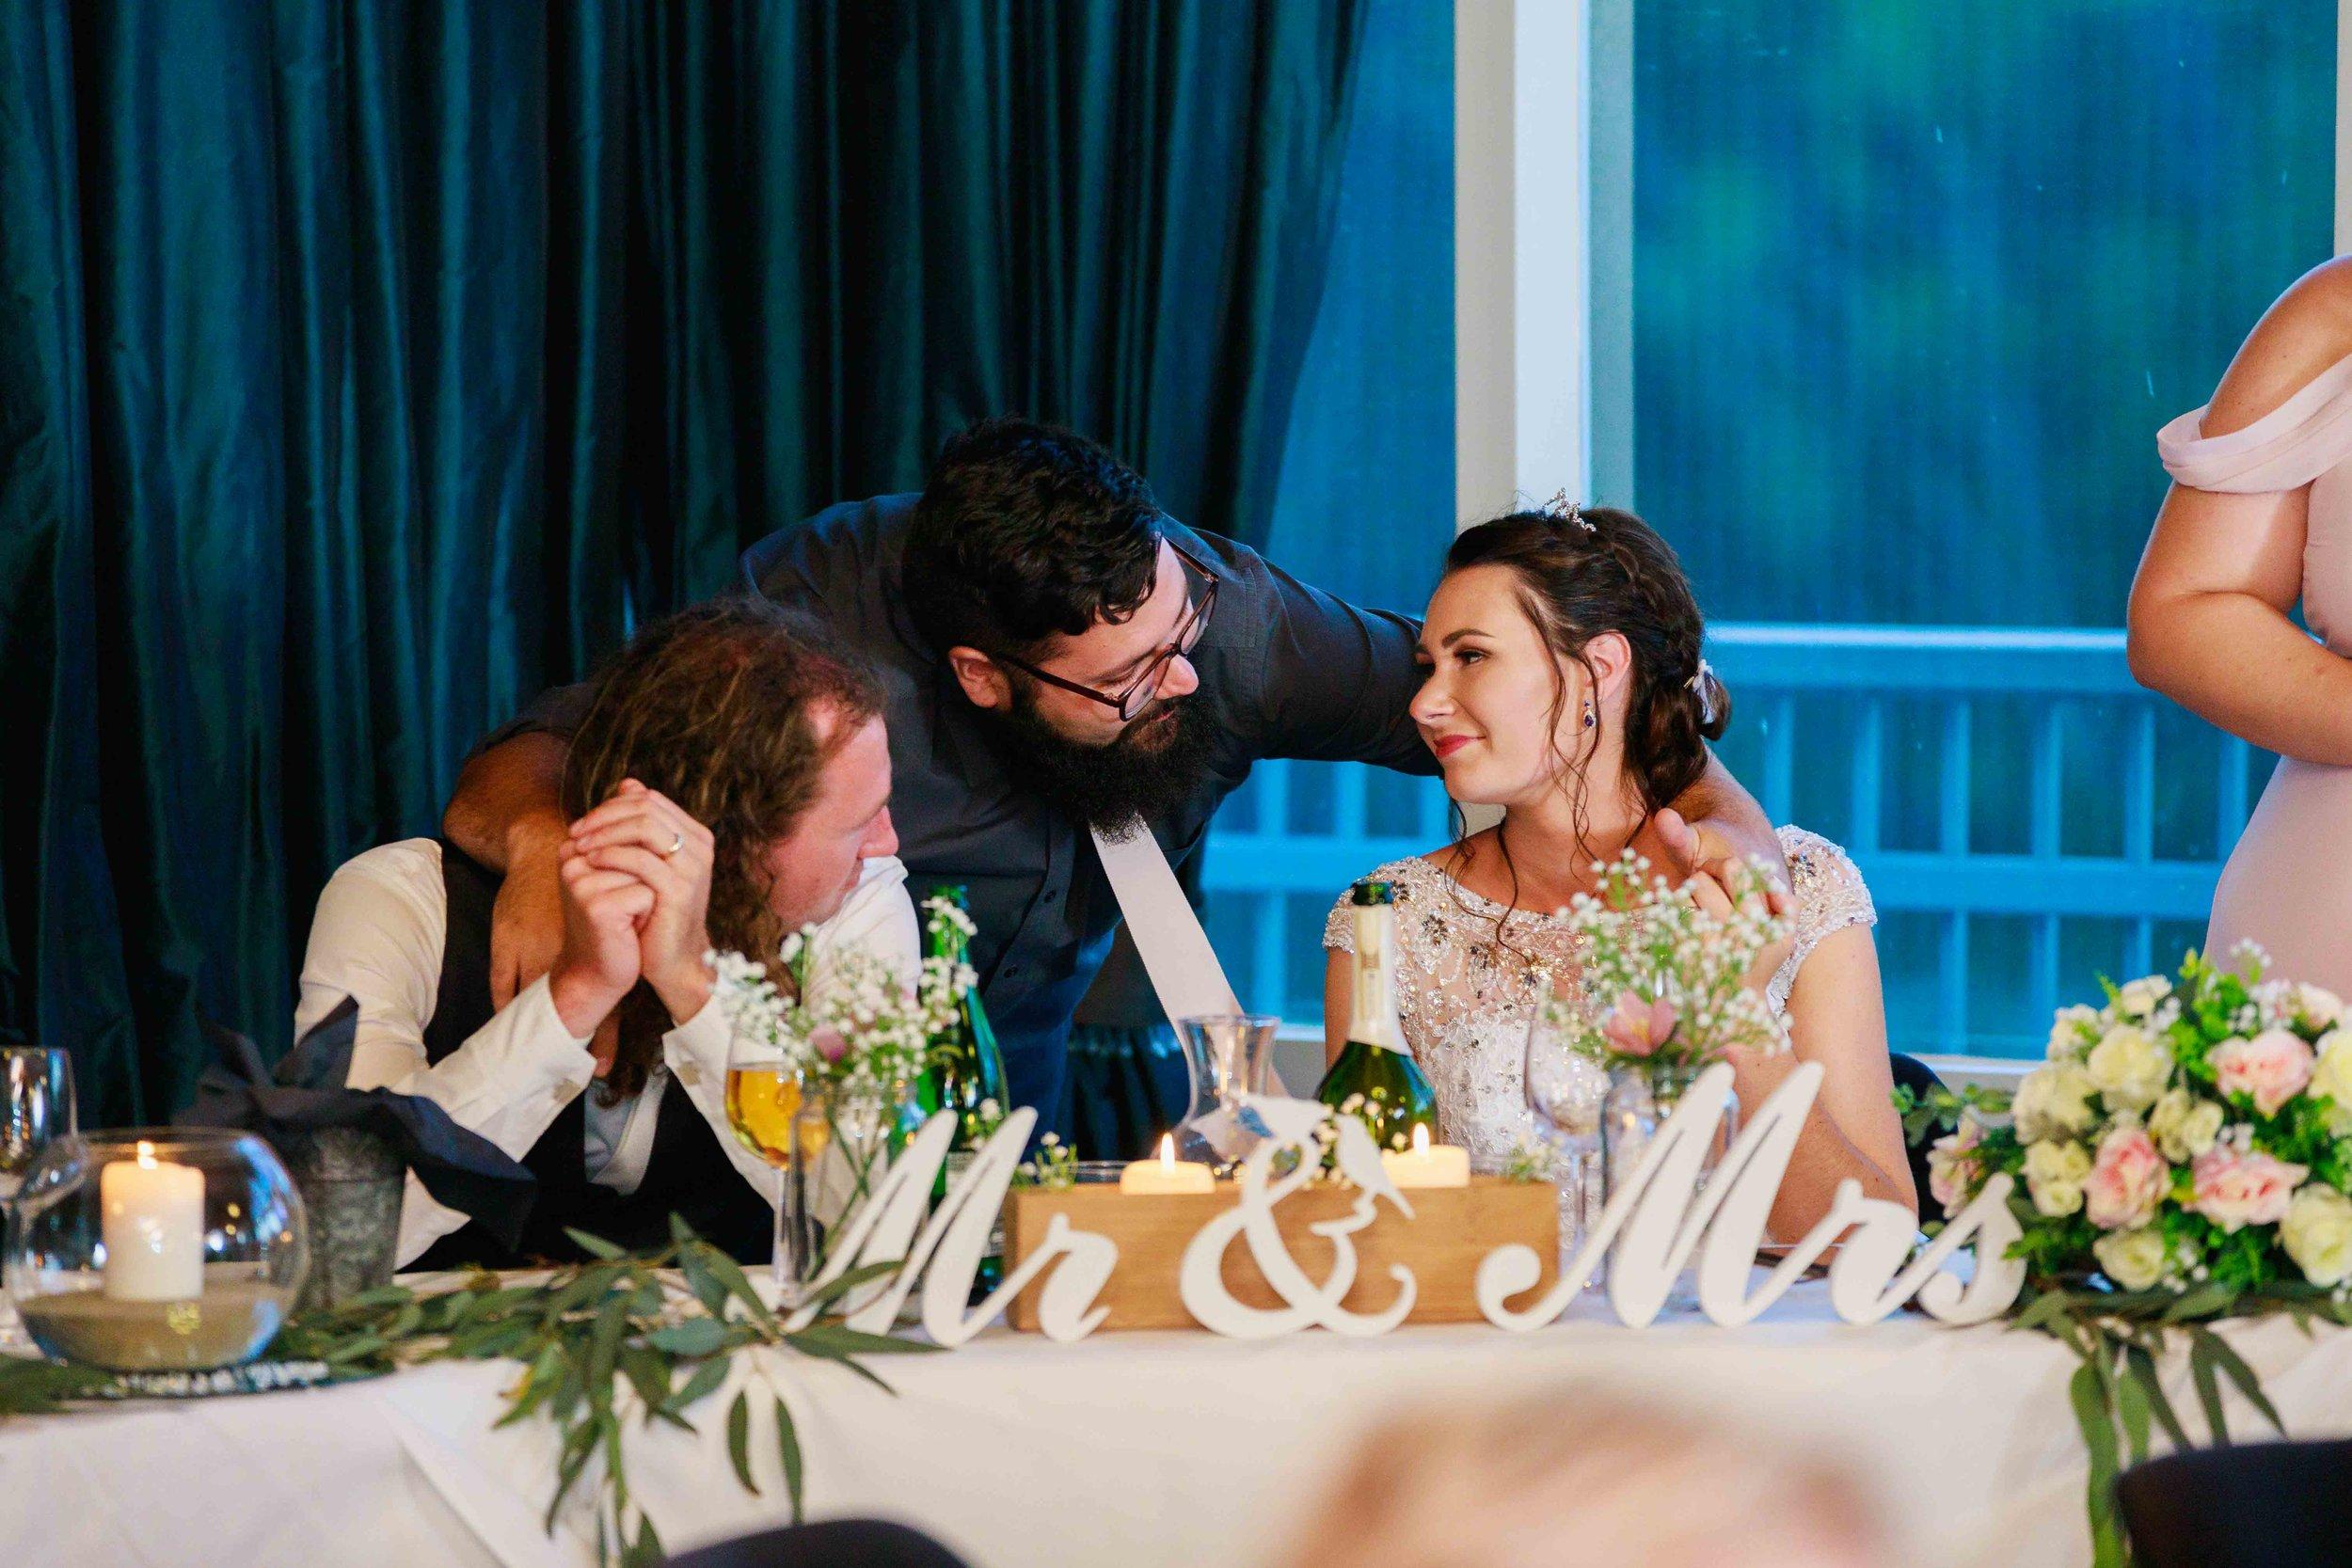 the-chalet-highlight-wedding-photography-palmerston-north-215.jpg